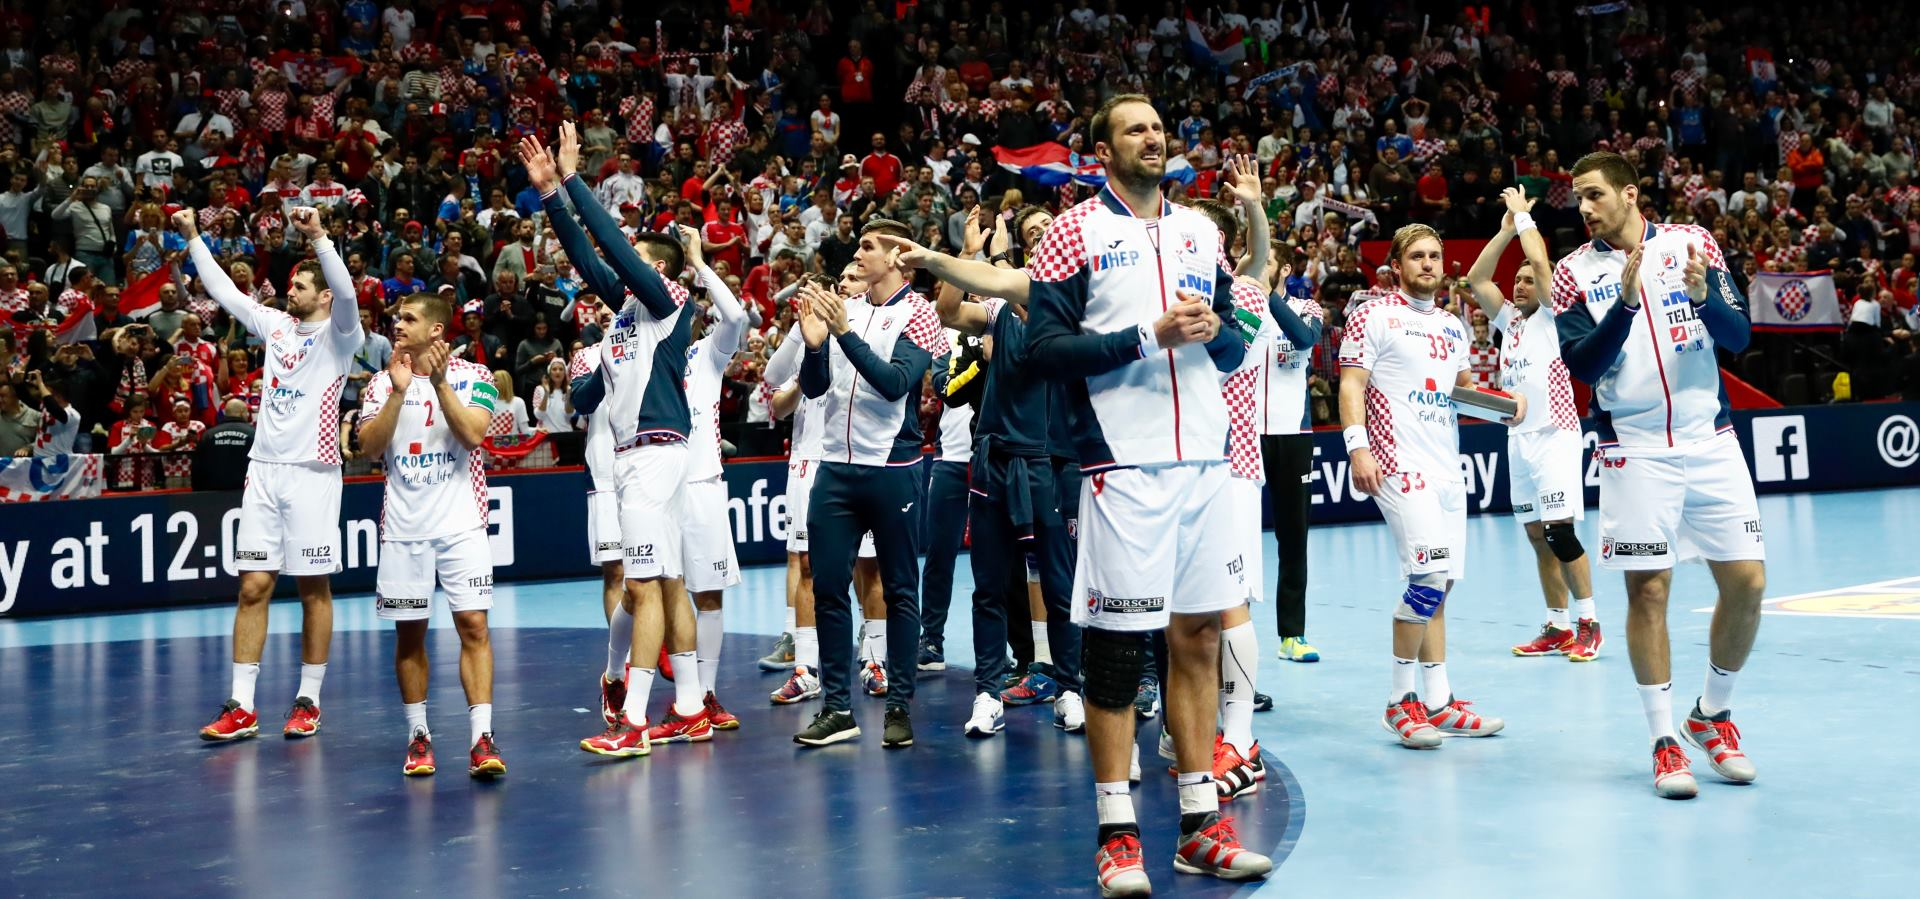 Pobjedom nad Islandom Hrvatska osigurala plasman u drugi krug Europskog prvenstva